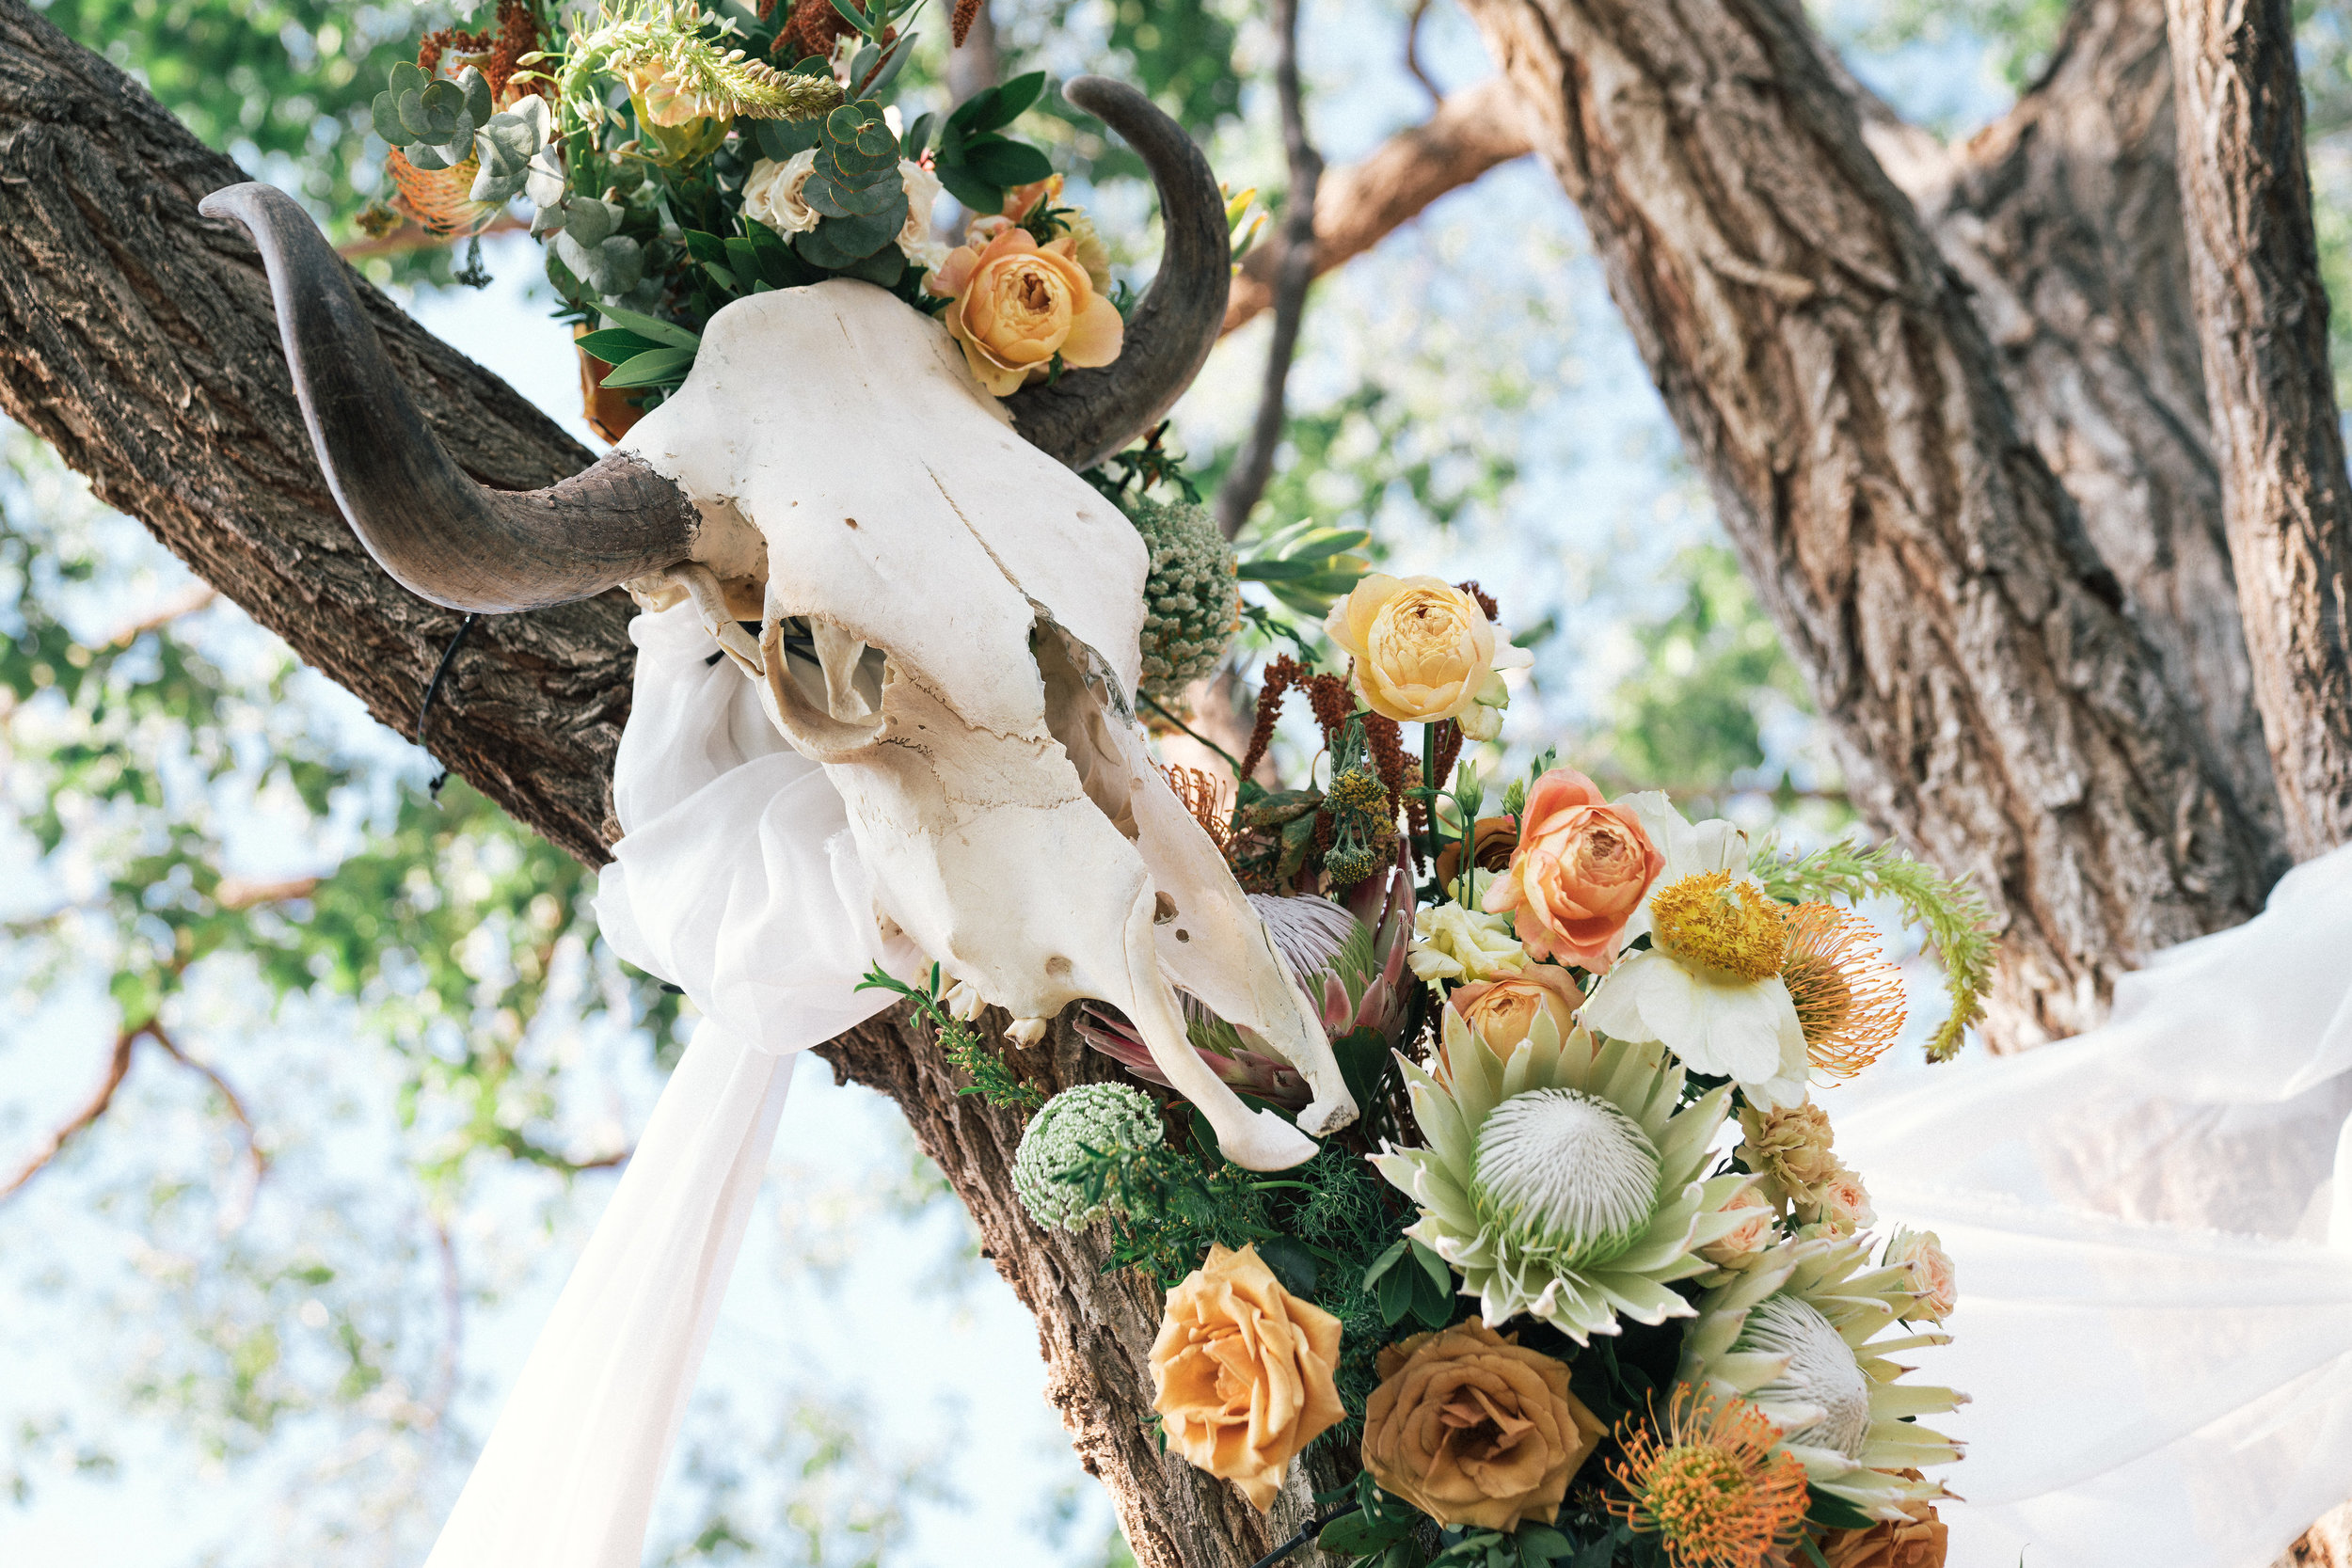 landry_lovelace_wedding_jbobephoto-312.jpg